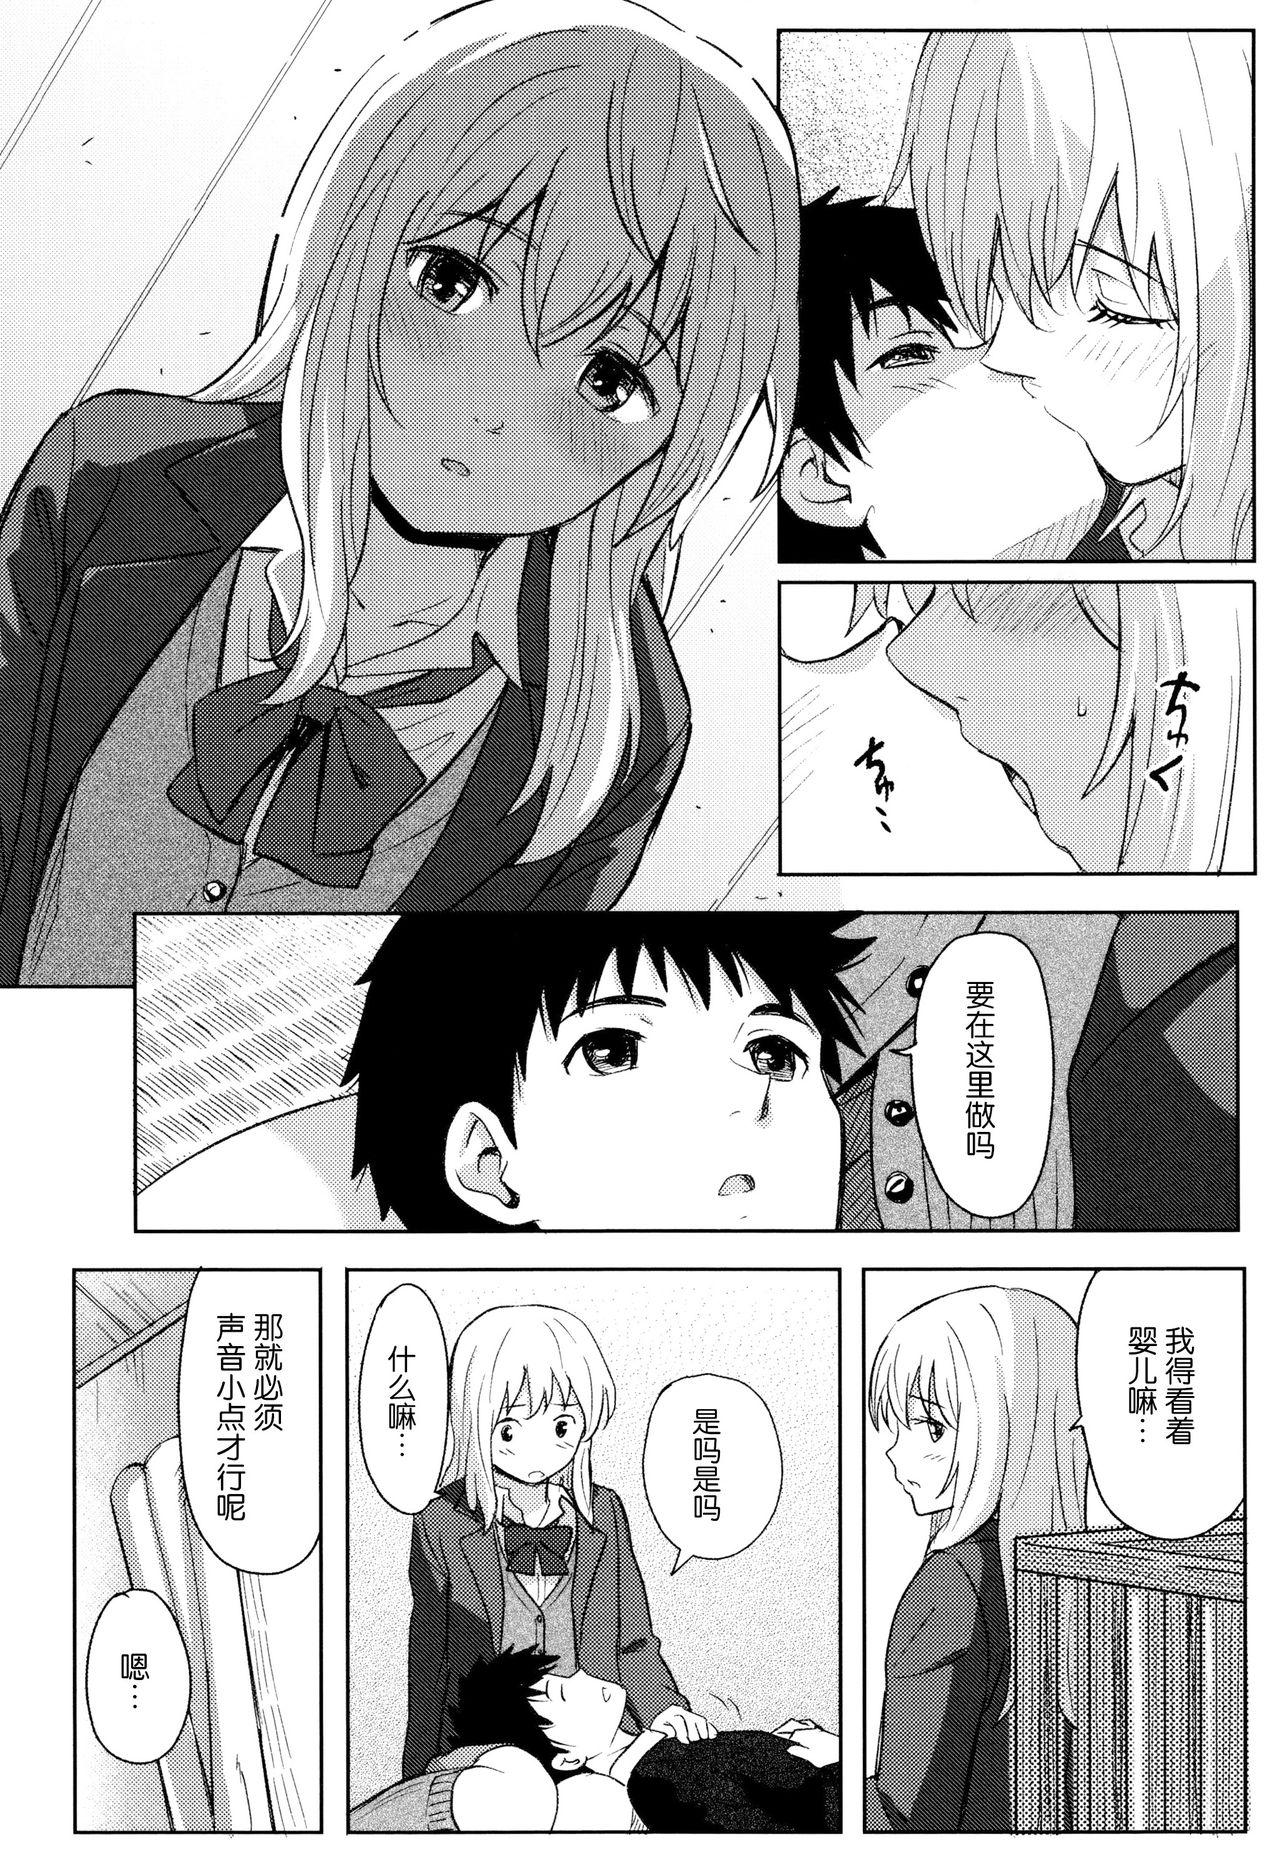 Tokubetsu na Mainichi - Special daily 20